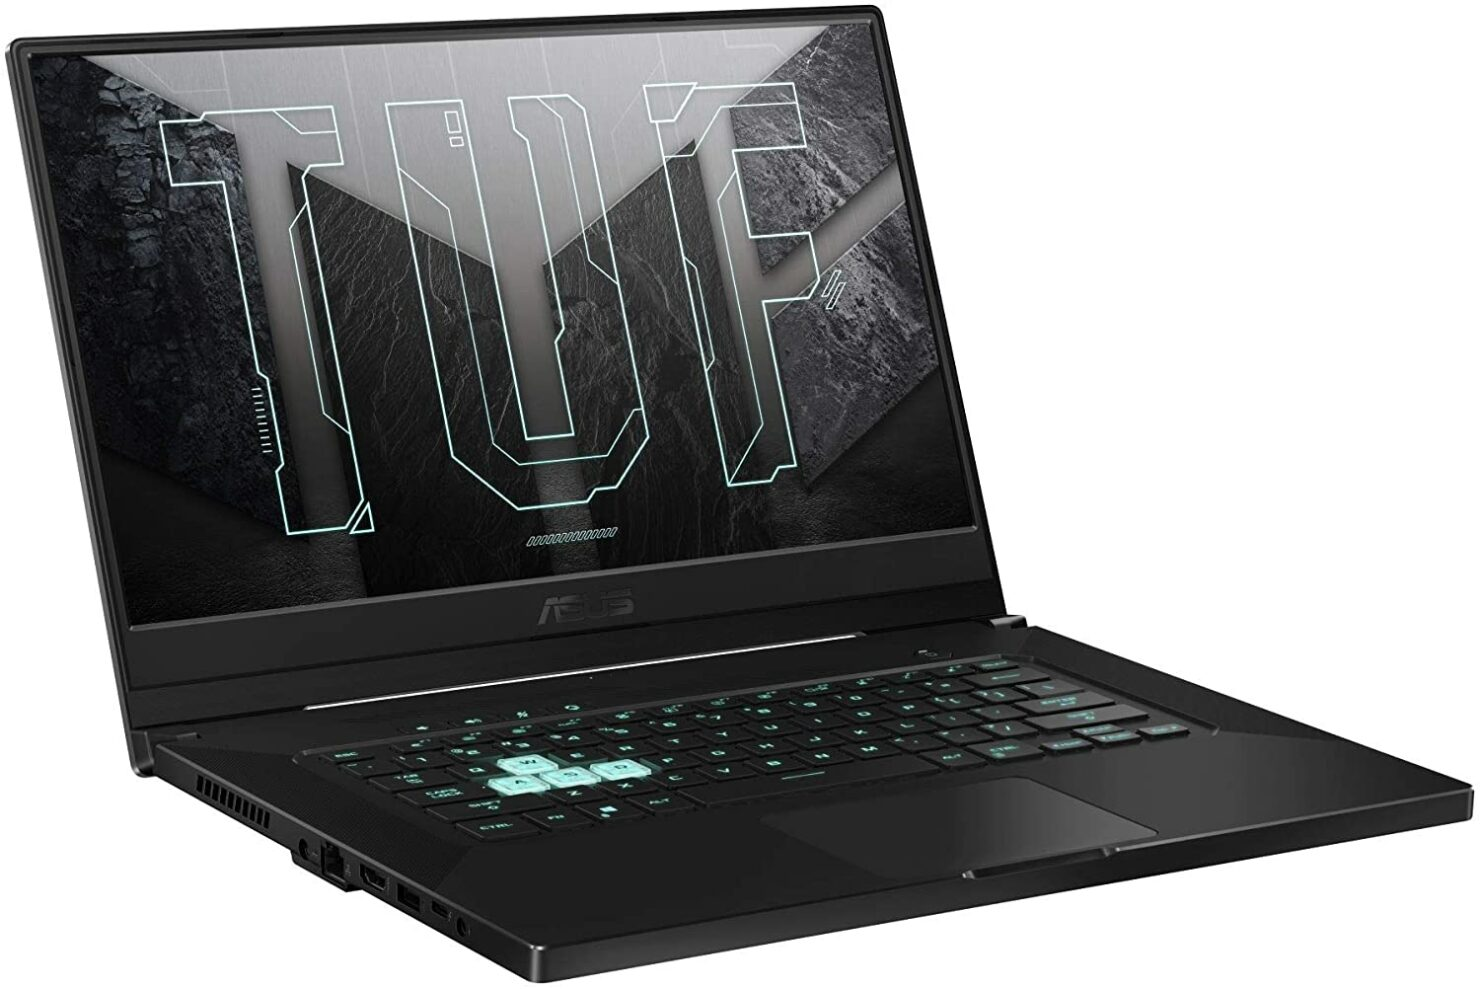 asus-tuf-gaming-dash-f15-laptop-with-nvidia-geforce-rtx-3050-gpu-intel-core-i5-11300h-cpu-_4